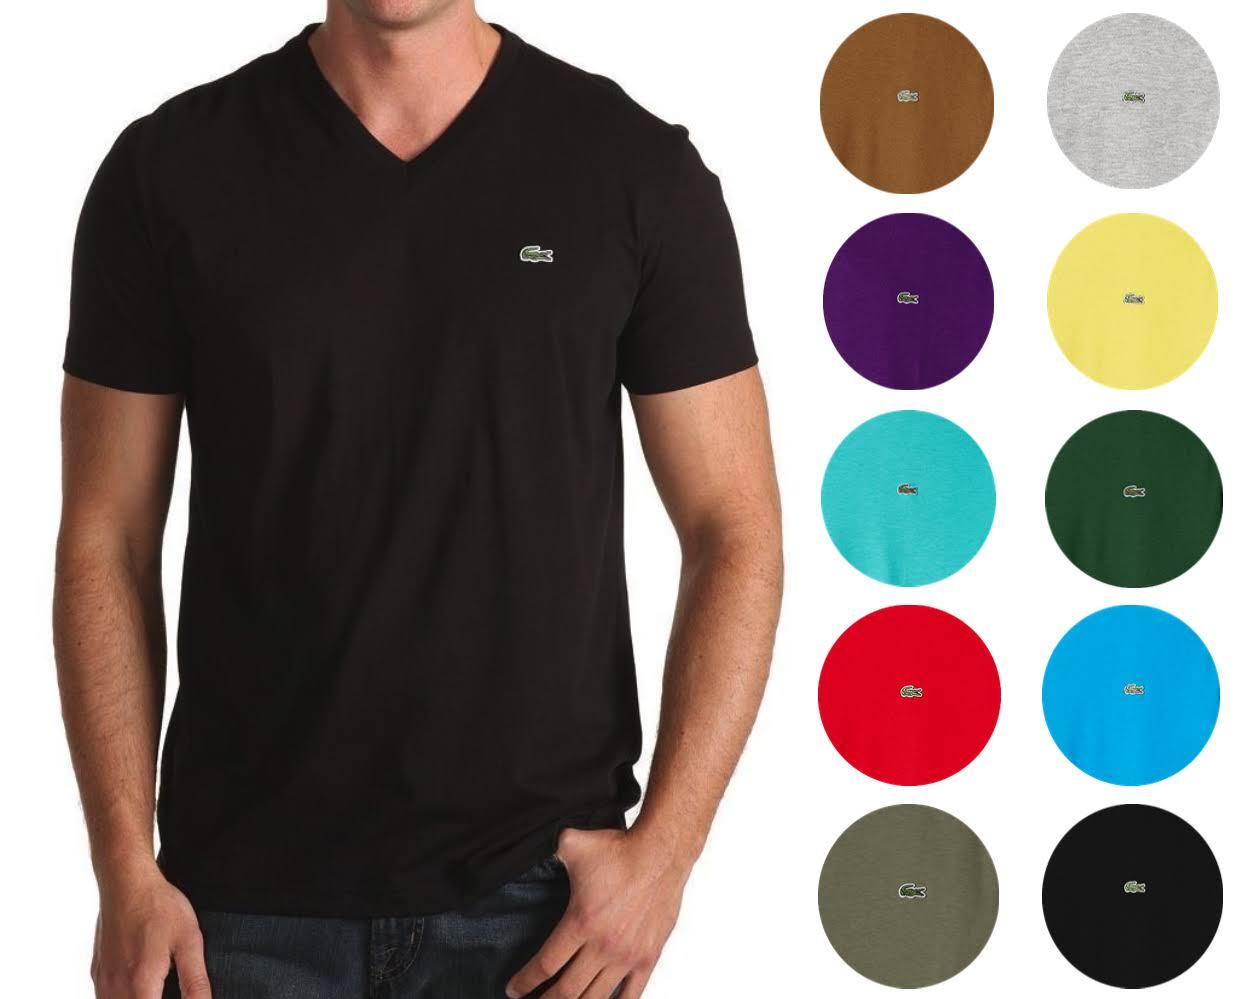 V jersey Th6710 Aus ausschnitt Lacoste t Mit shirt Regular Herren Kurzarm Pima 4wnqwUOfX